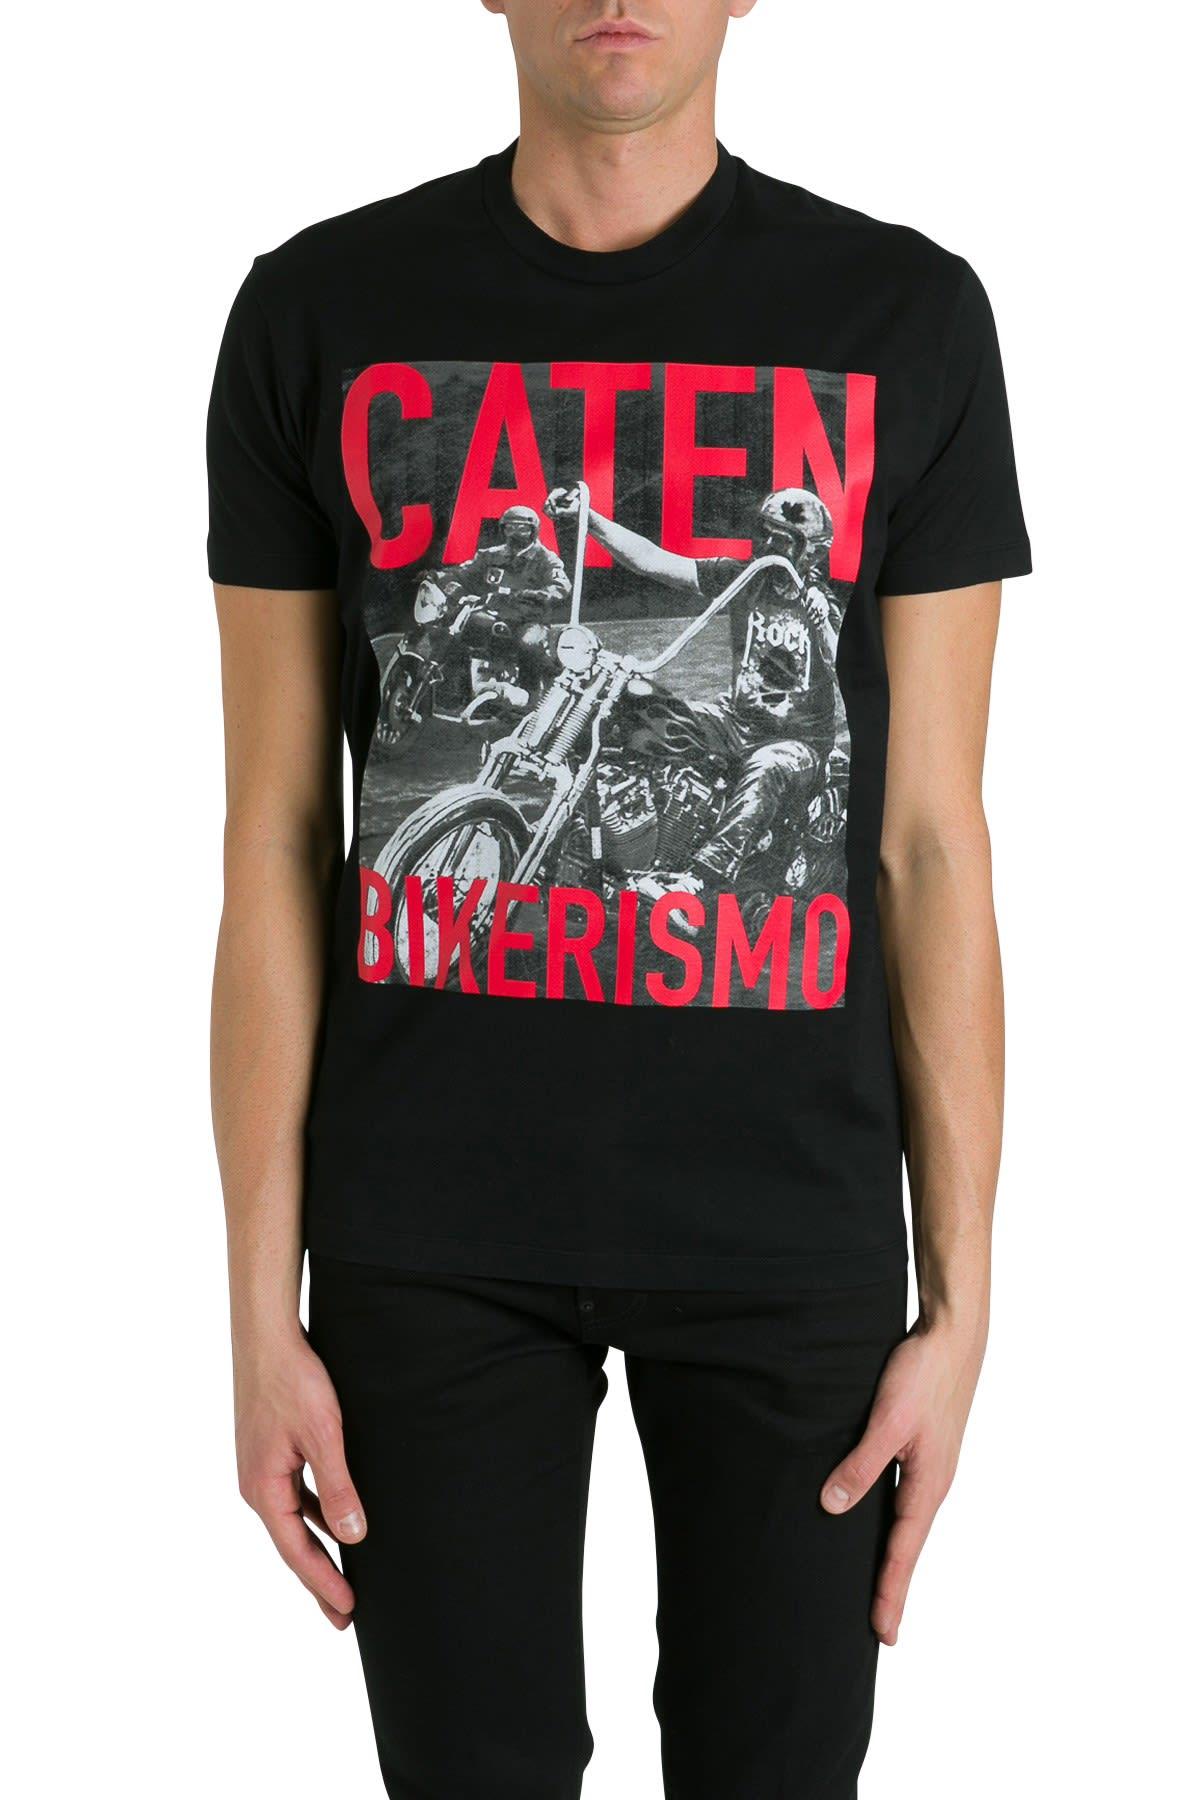 Dsquared2 Caten Bikerismo T-shirt